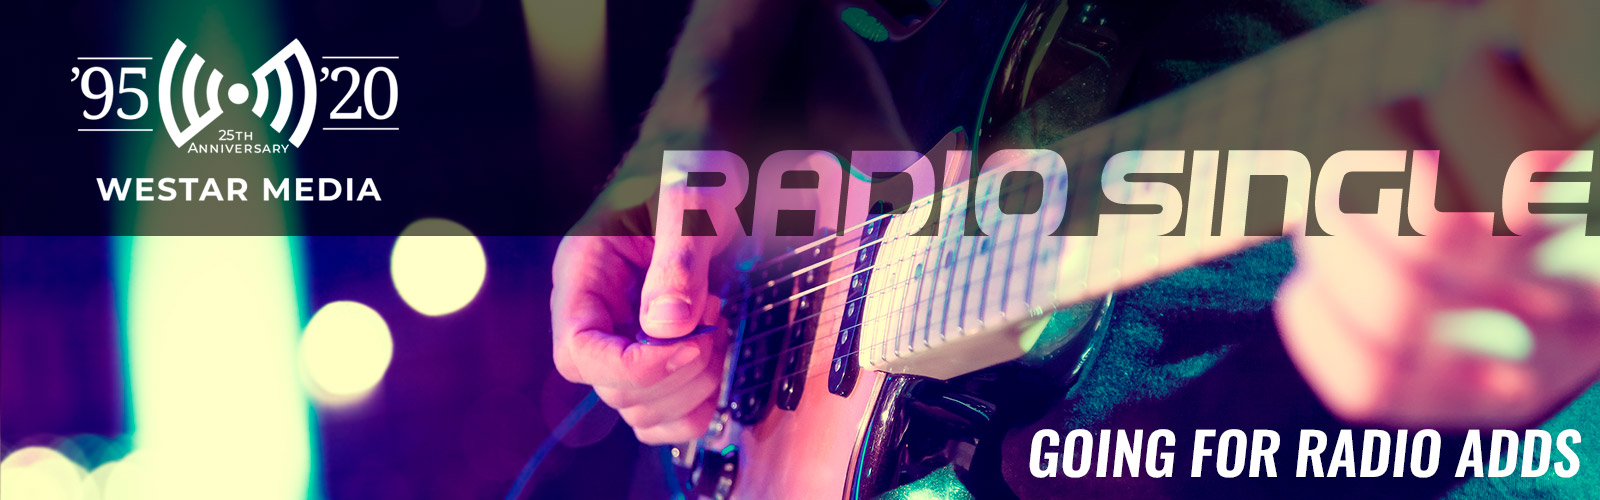 radiosingleheader